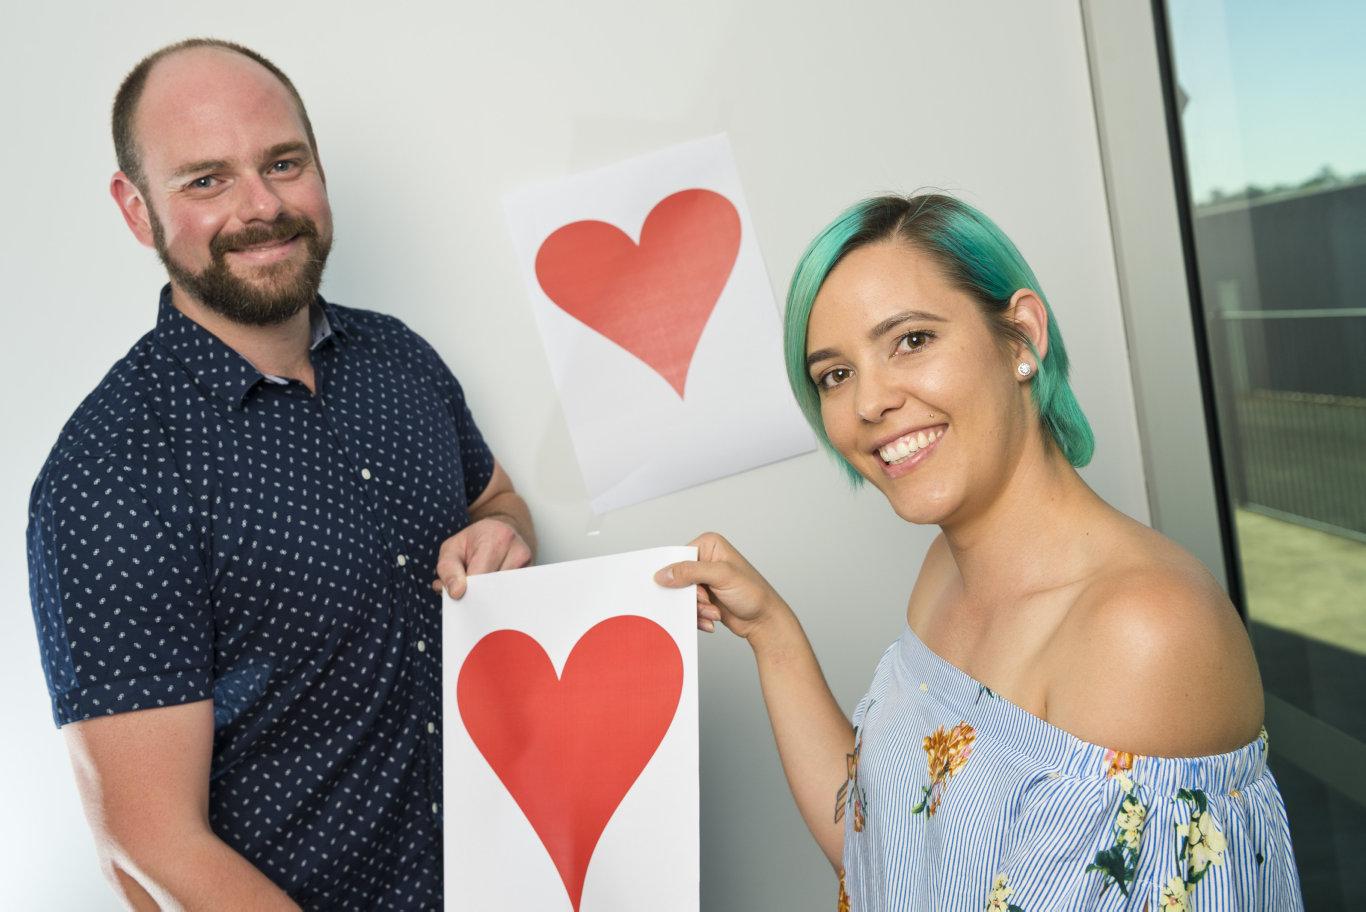 Tim Swinson and Aleisha Cowan won The Chronicle's inaugural Bachelor and Bachelorette-inspired match-making initiative.